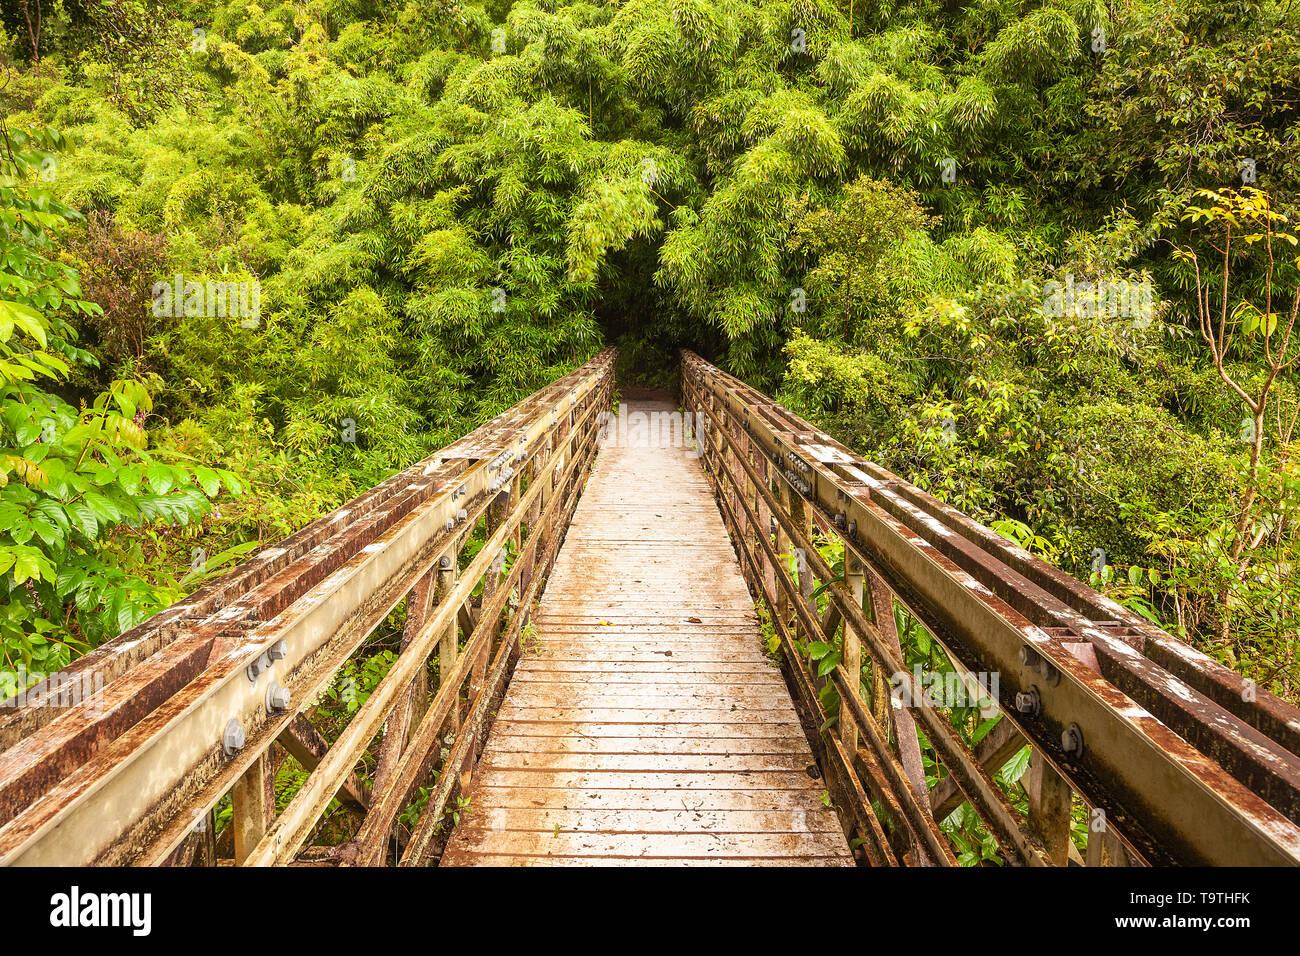 Bridge over river into Bamboo forest, Maui, Hawaii, USA Stock Photo